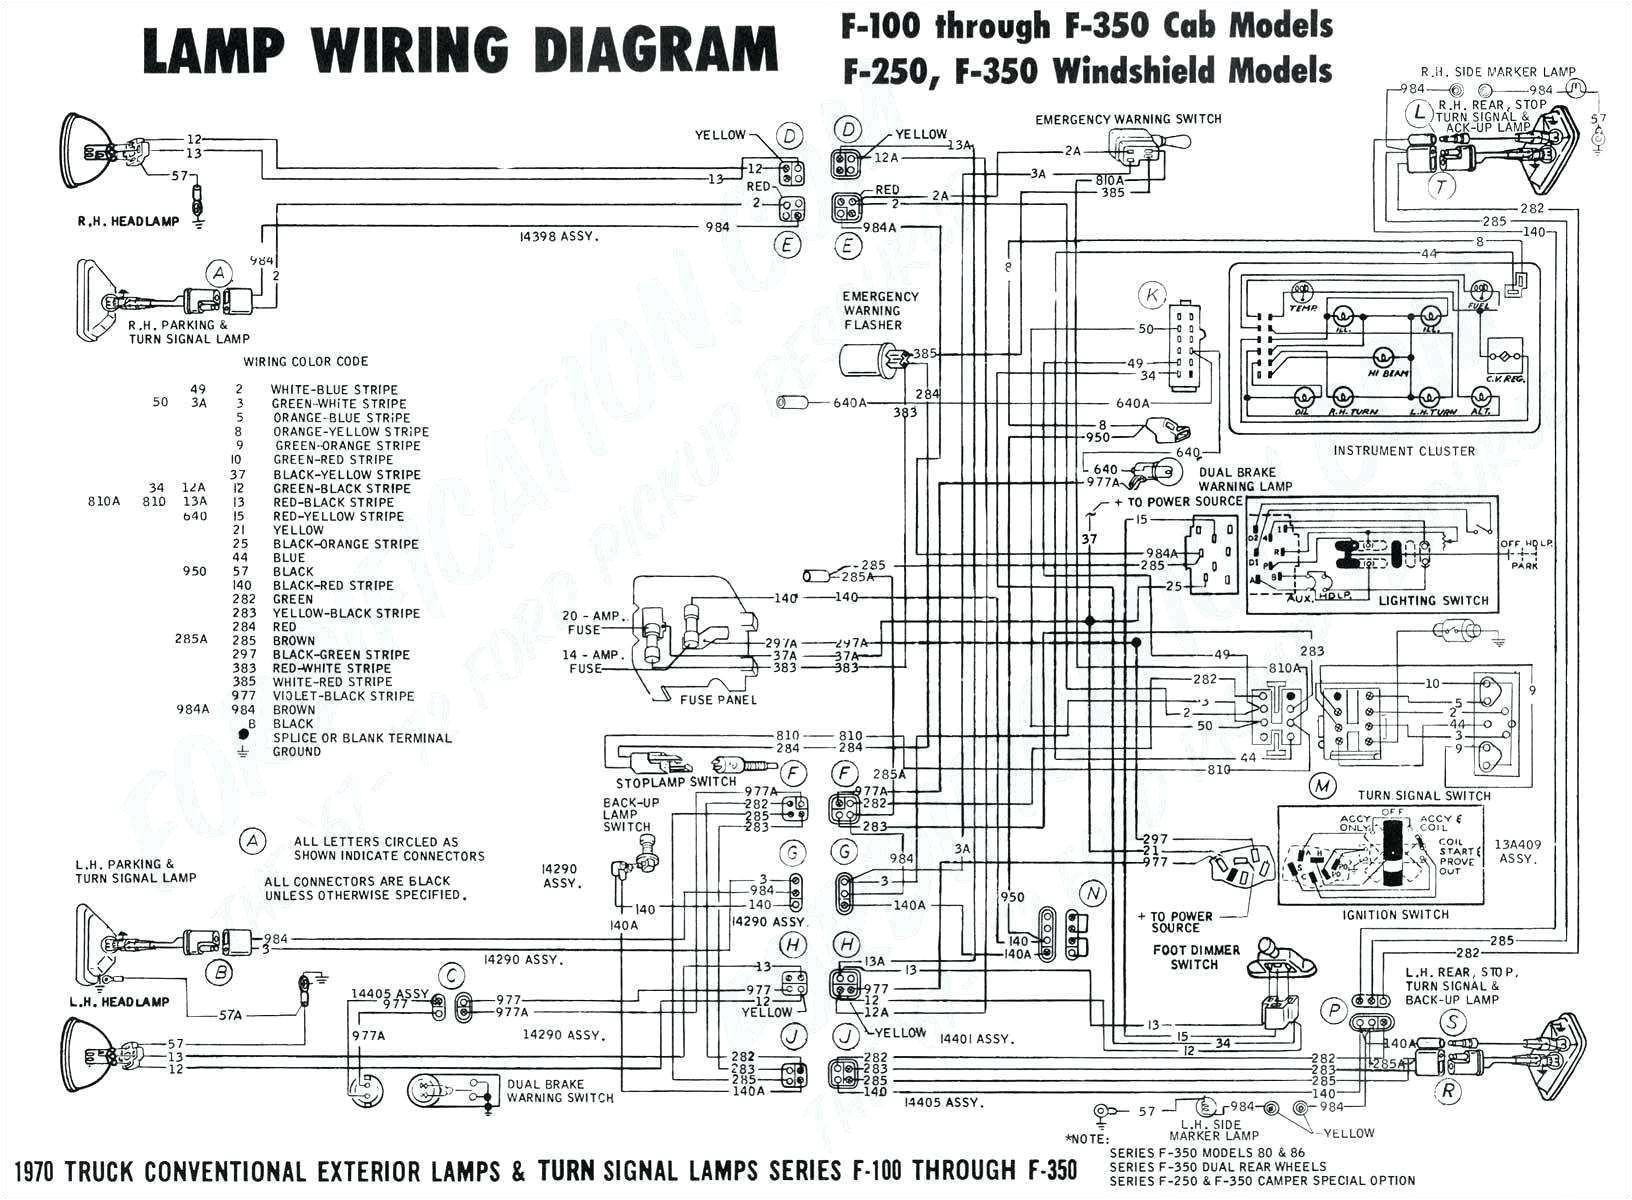 1996 Impala Ss Spark Plug Wires Diagram Zl 5611 Wiring Diagram Additionally 1997 Chevy Brake Light